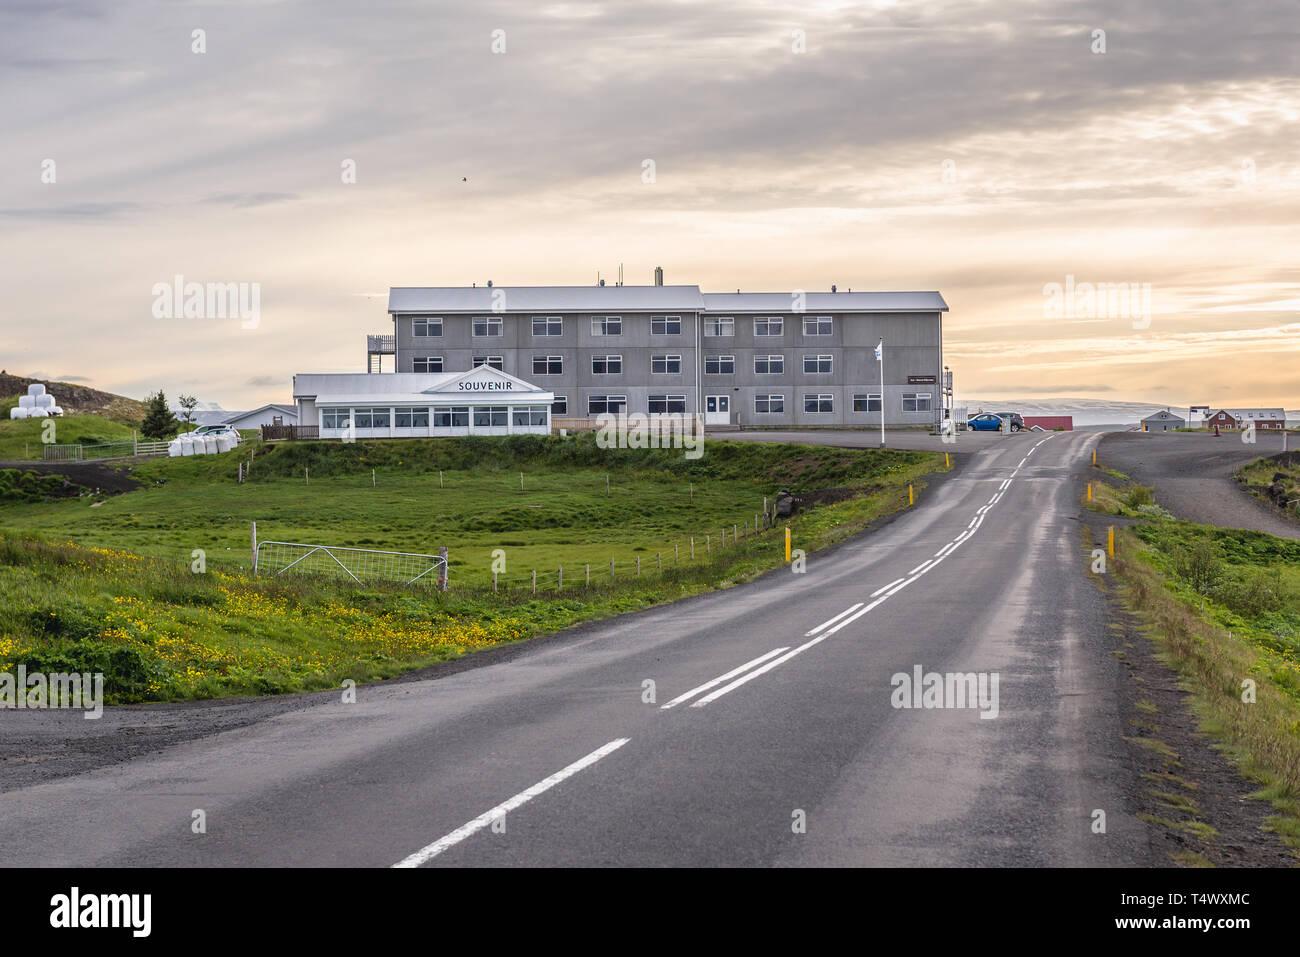 Road 848 and Hotel Myvatn in Skutustadir villae in Iceland Stock Photo